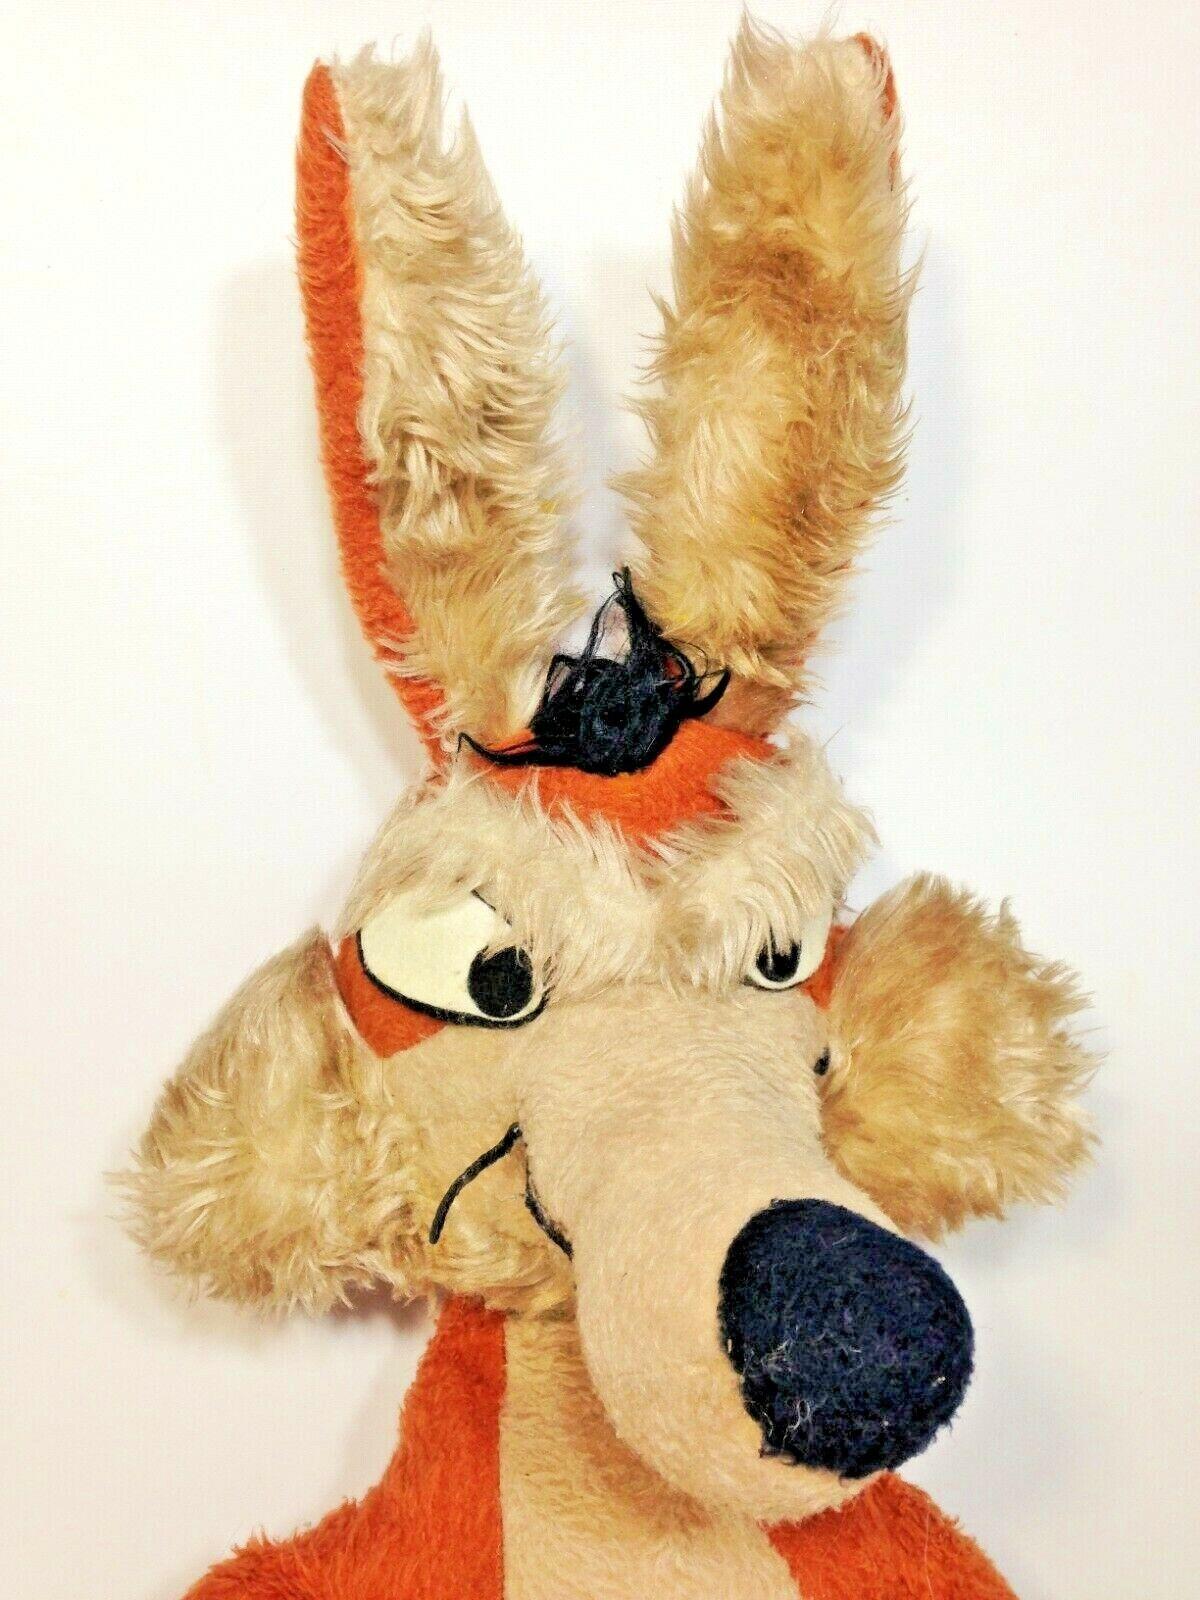 Wile E Coyote Plush Plush Plush RARE Jumbo 32  Warner Bros Looney Tunes Vintage 1970's Toy 224